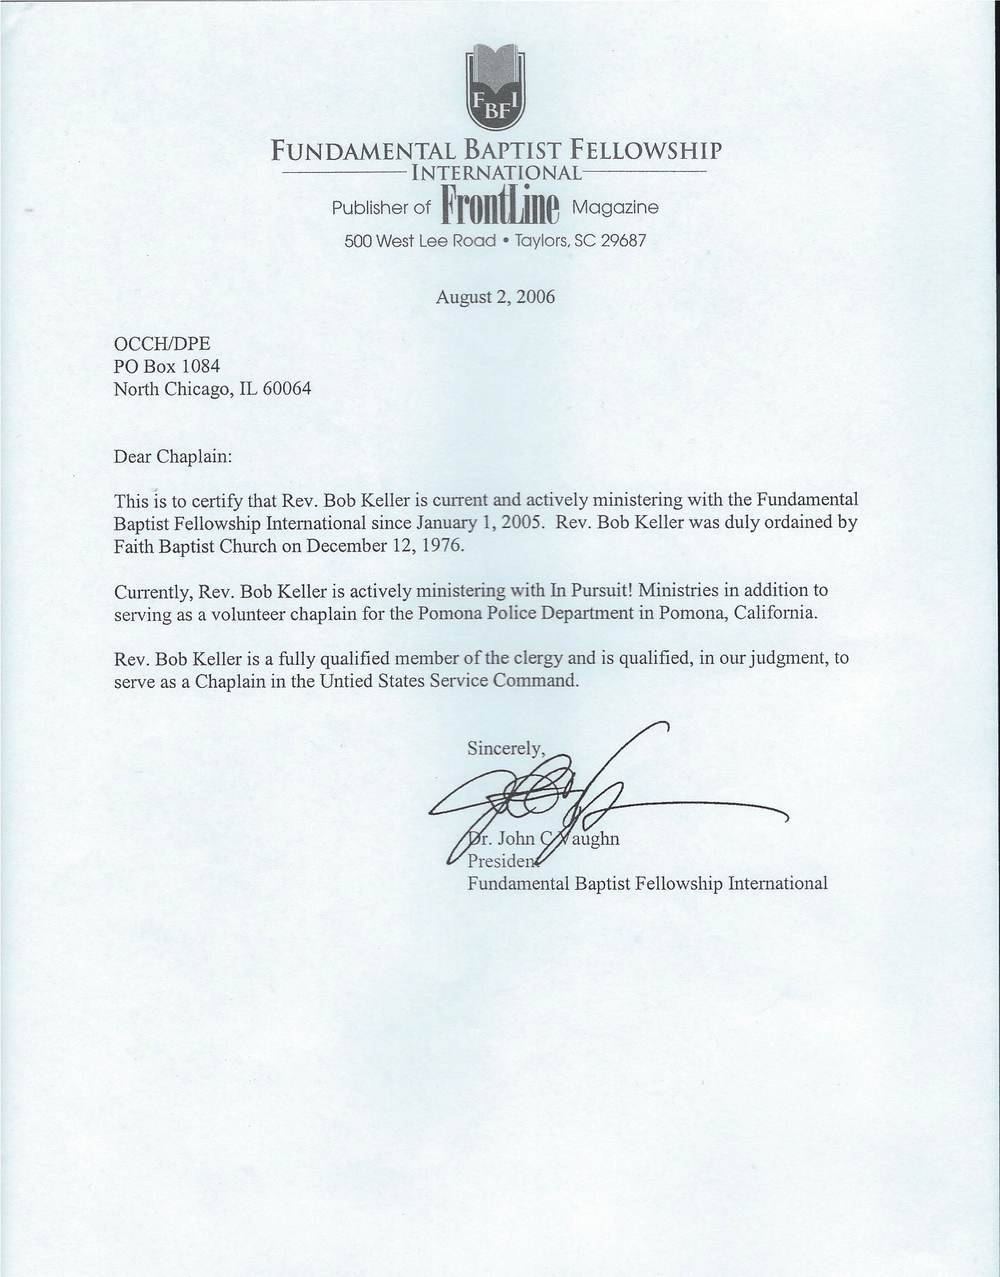 FBFI-Certification.jpg